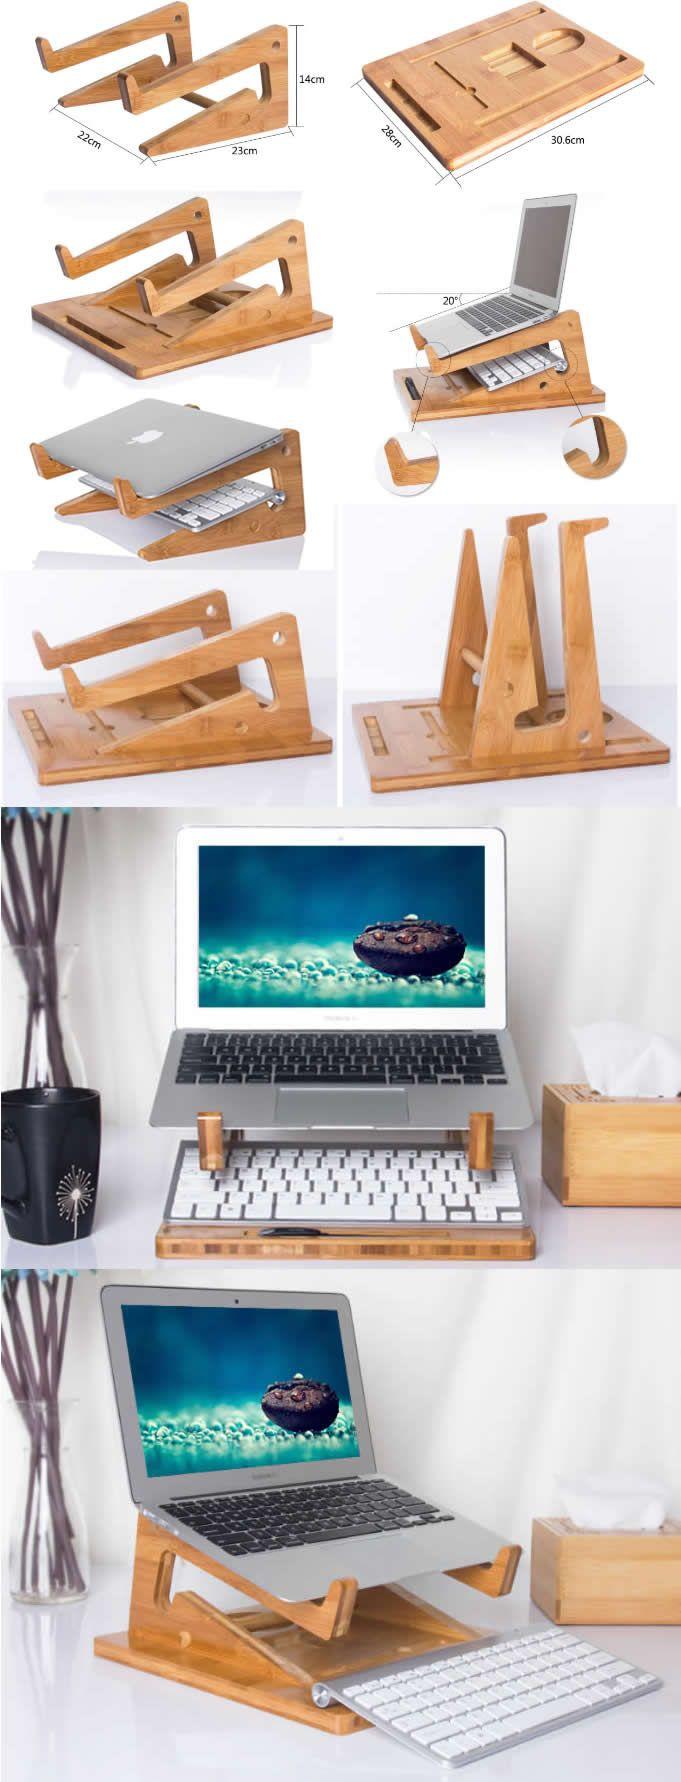 Bamboo Wooden Laptop Macbook Folding Cooling Stand Riser Dock Laptop Desk Desktop Stand Holder Mount Cradle for Laptop Notebook Tablets iPad Macbook Air or Pro